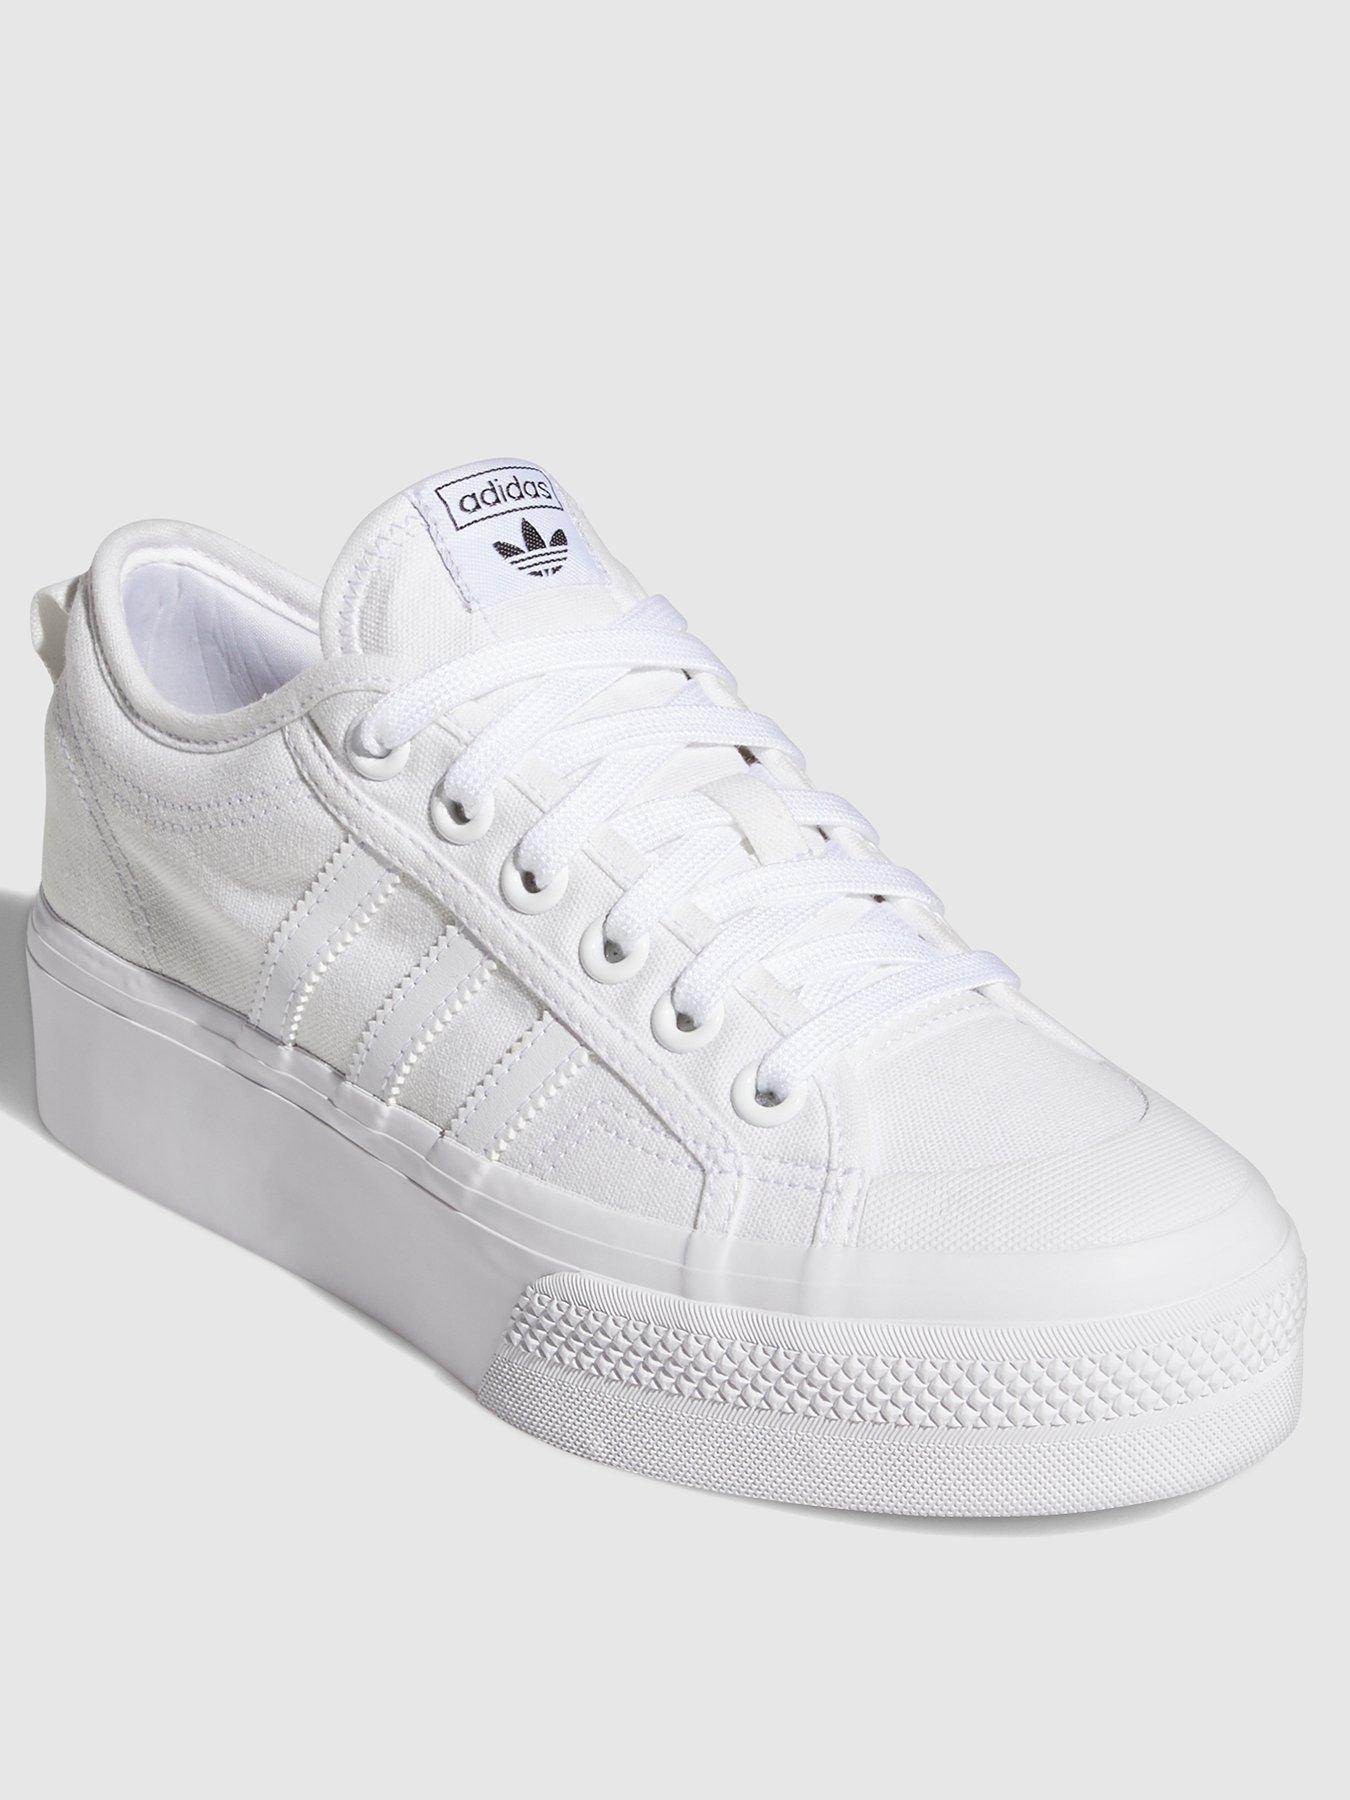 womens adidas trainers size 6 uk